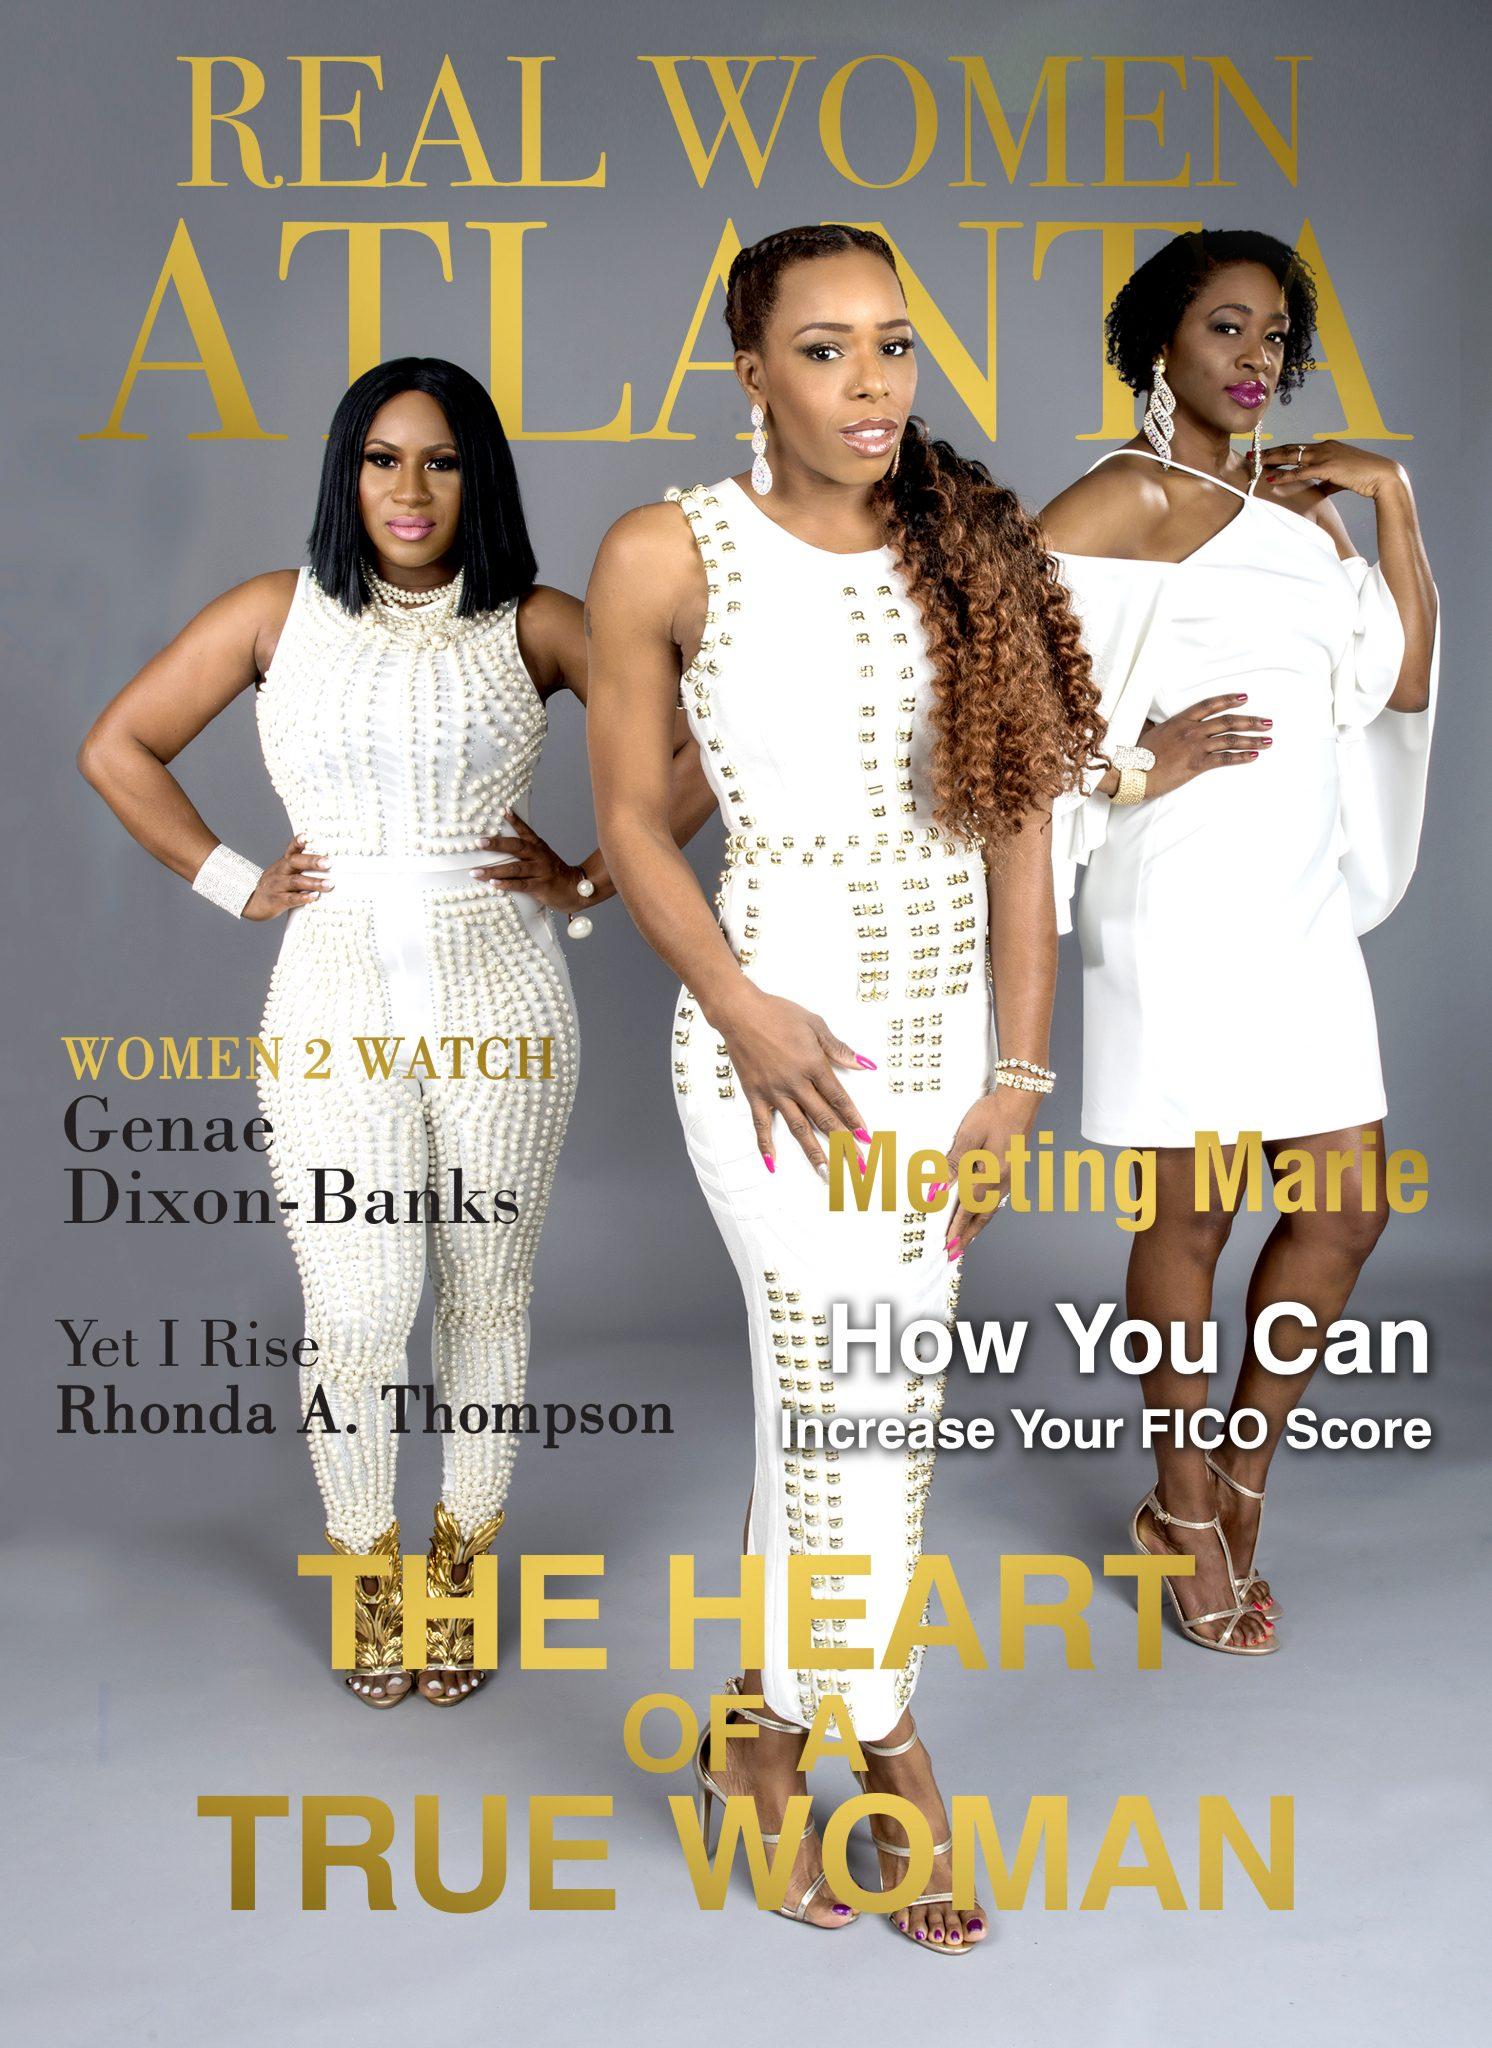 Talking With Tami Beauty Column In Real Women Atlanta